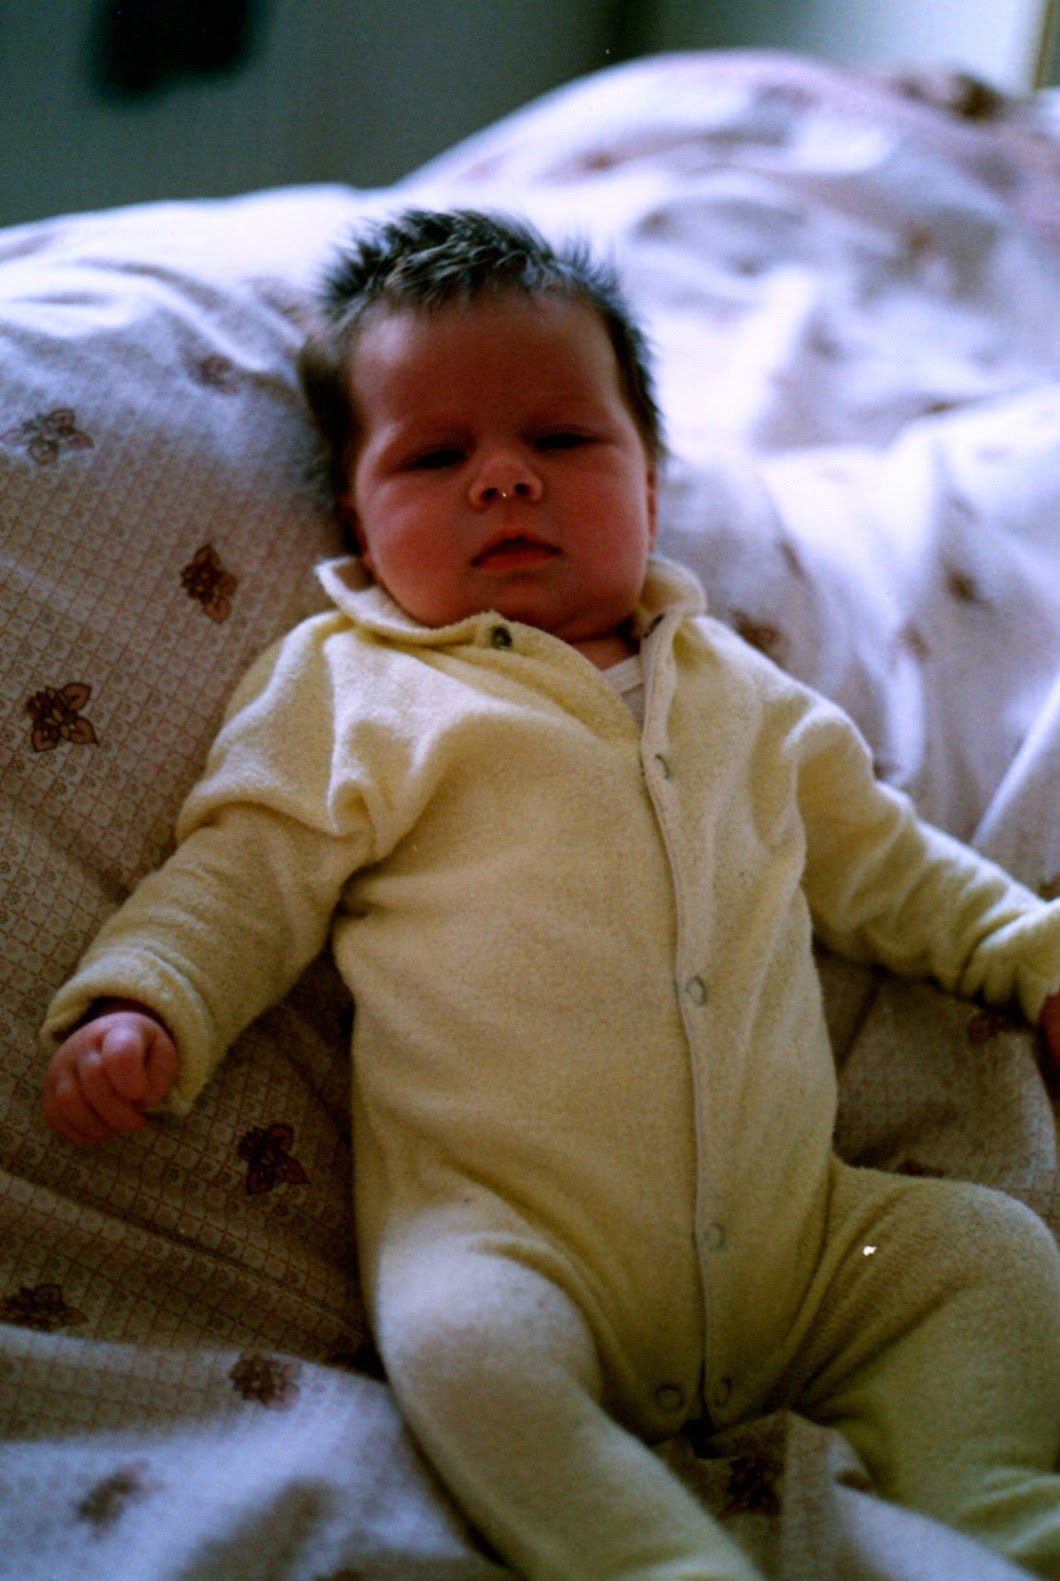 Jessica Powell baby pic